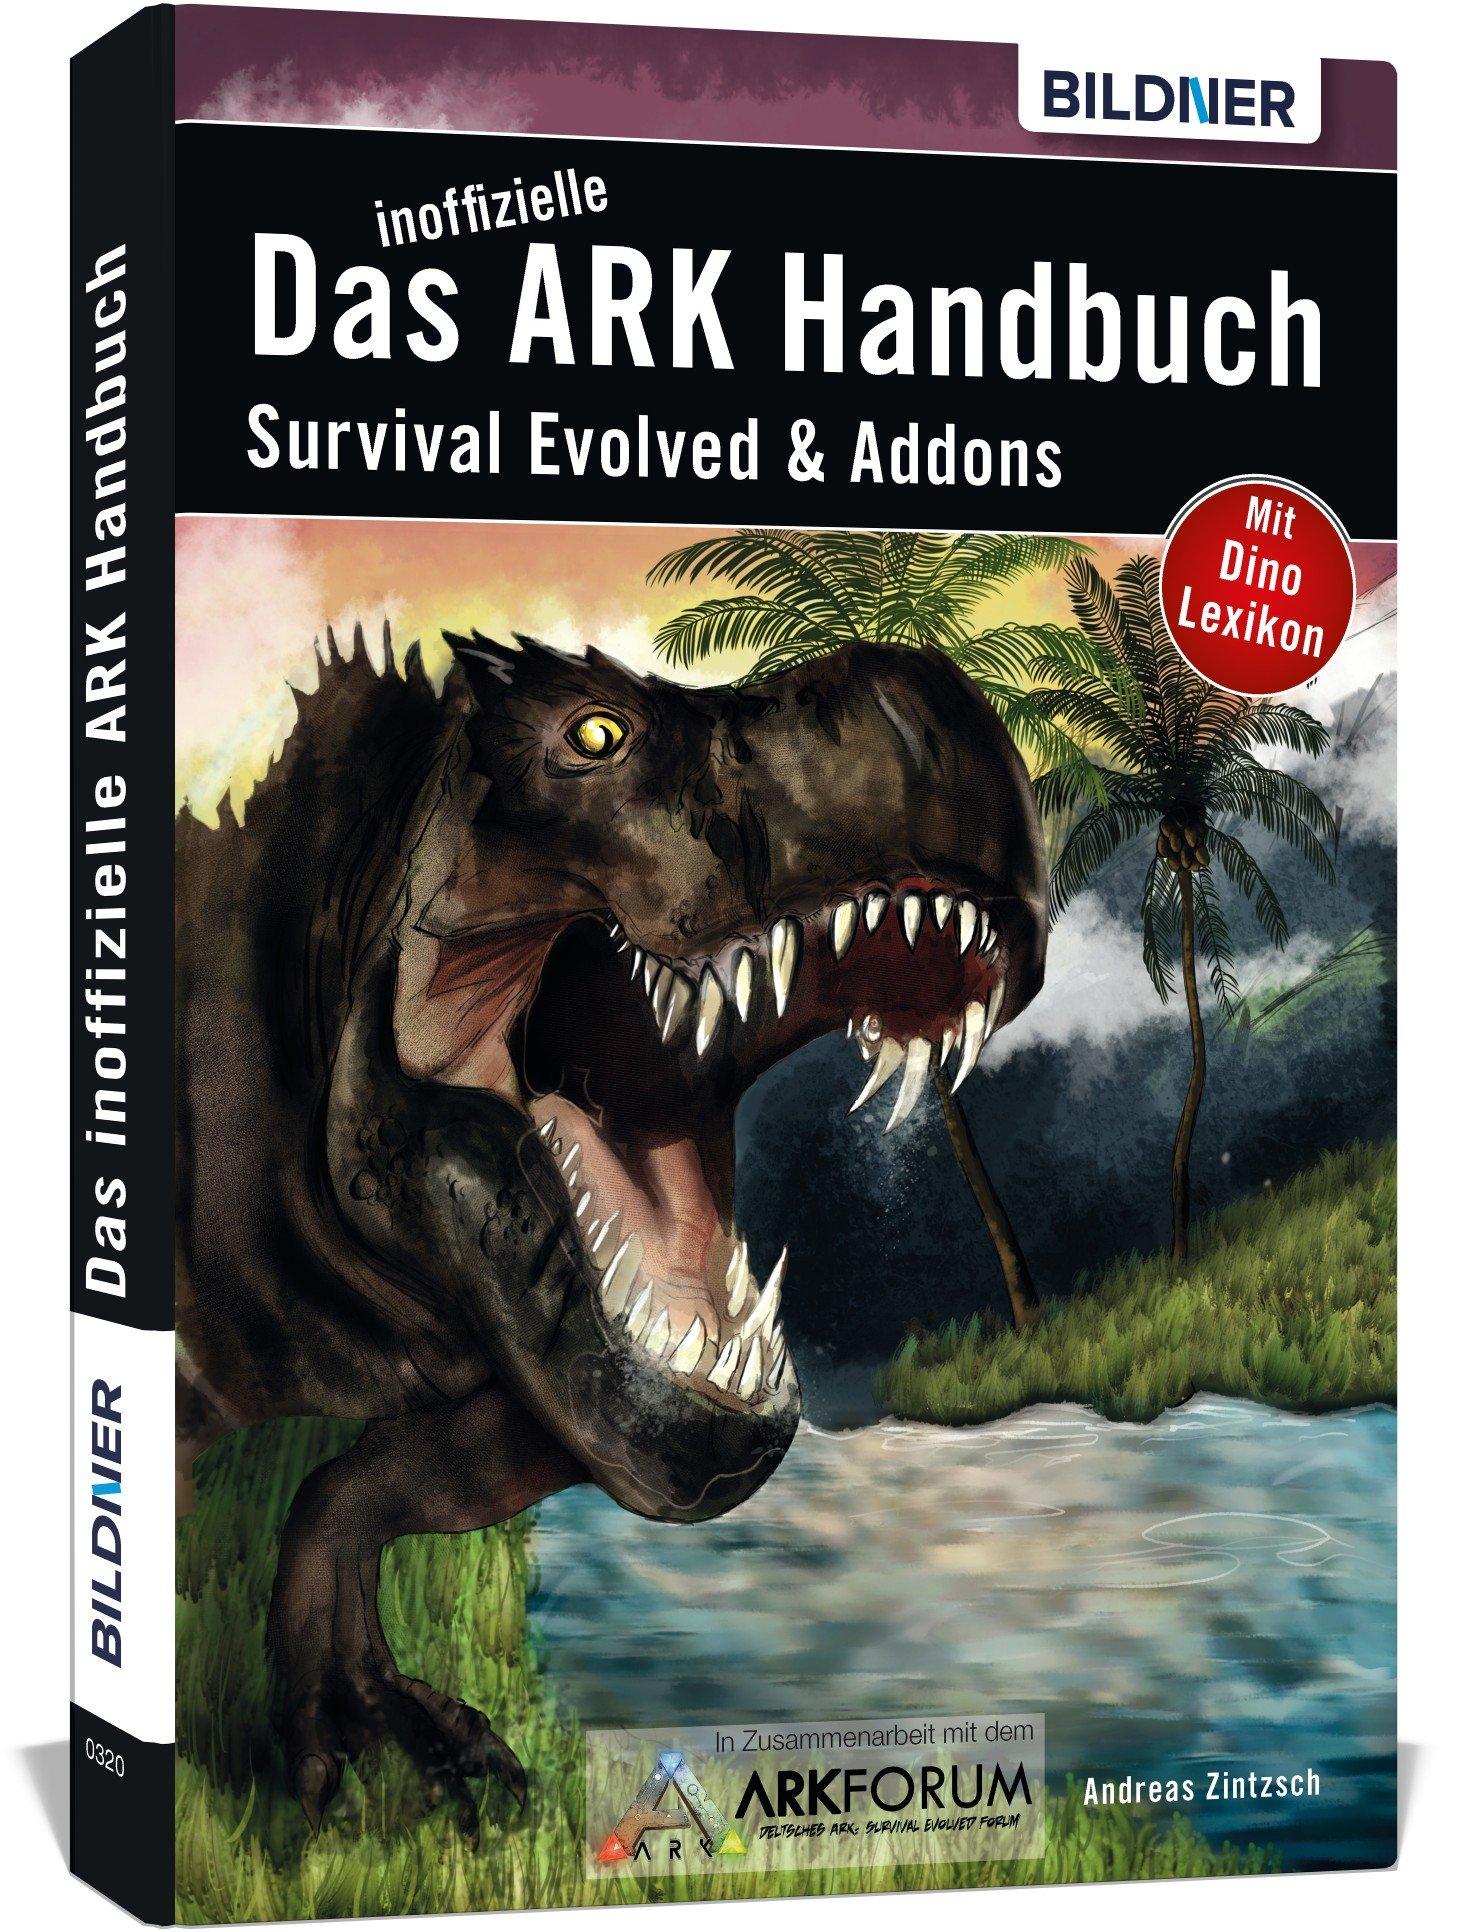 Das inoffizielle ARK-Handbuch: Survival Evolved & Add-ons: Amazon.es: Zintzsch, Andreas: Libros en idiomas extranjeros